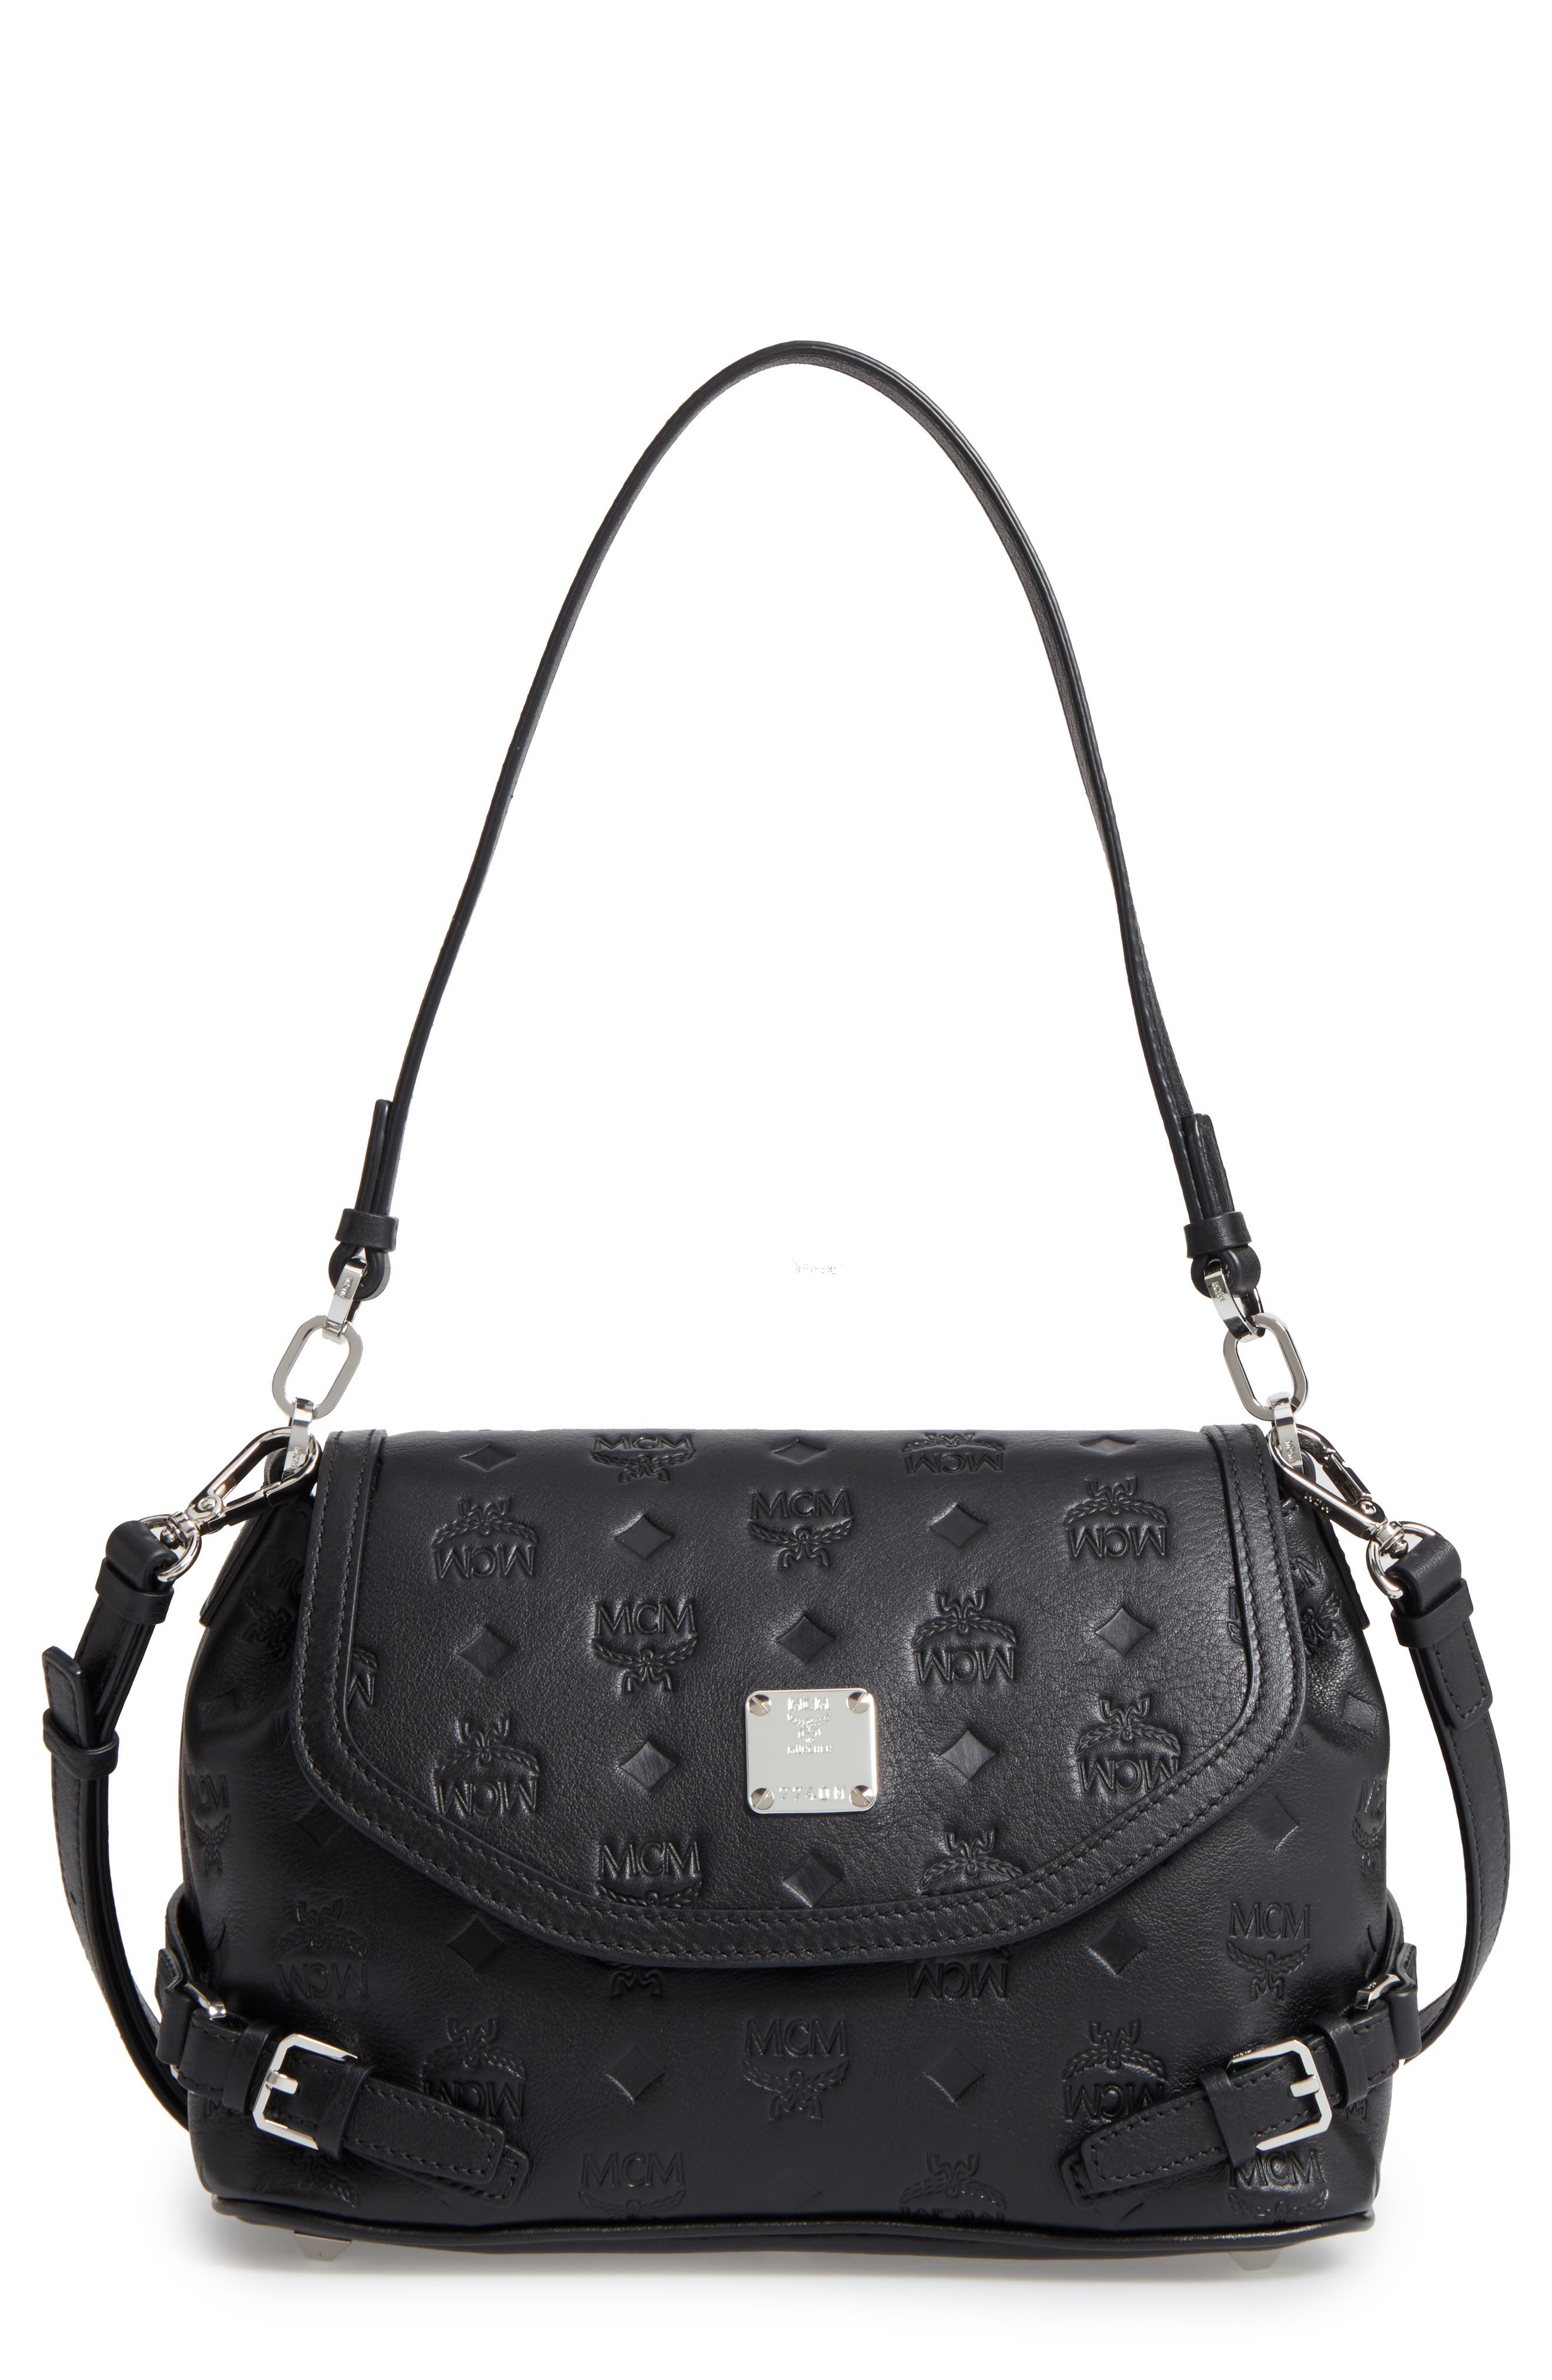 Main Image - MCM Signature Monogram Embossed Leather Shoulder/Crossbody Bag